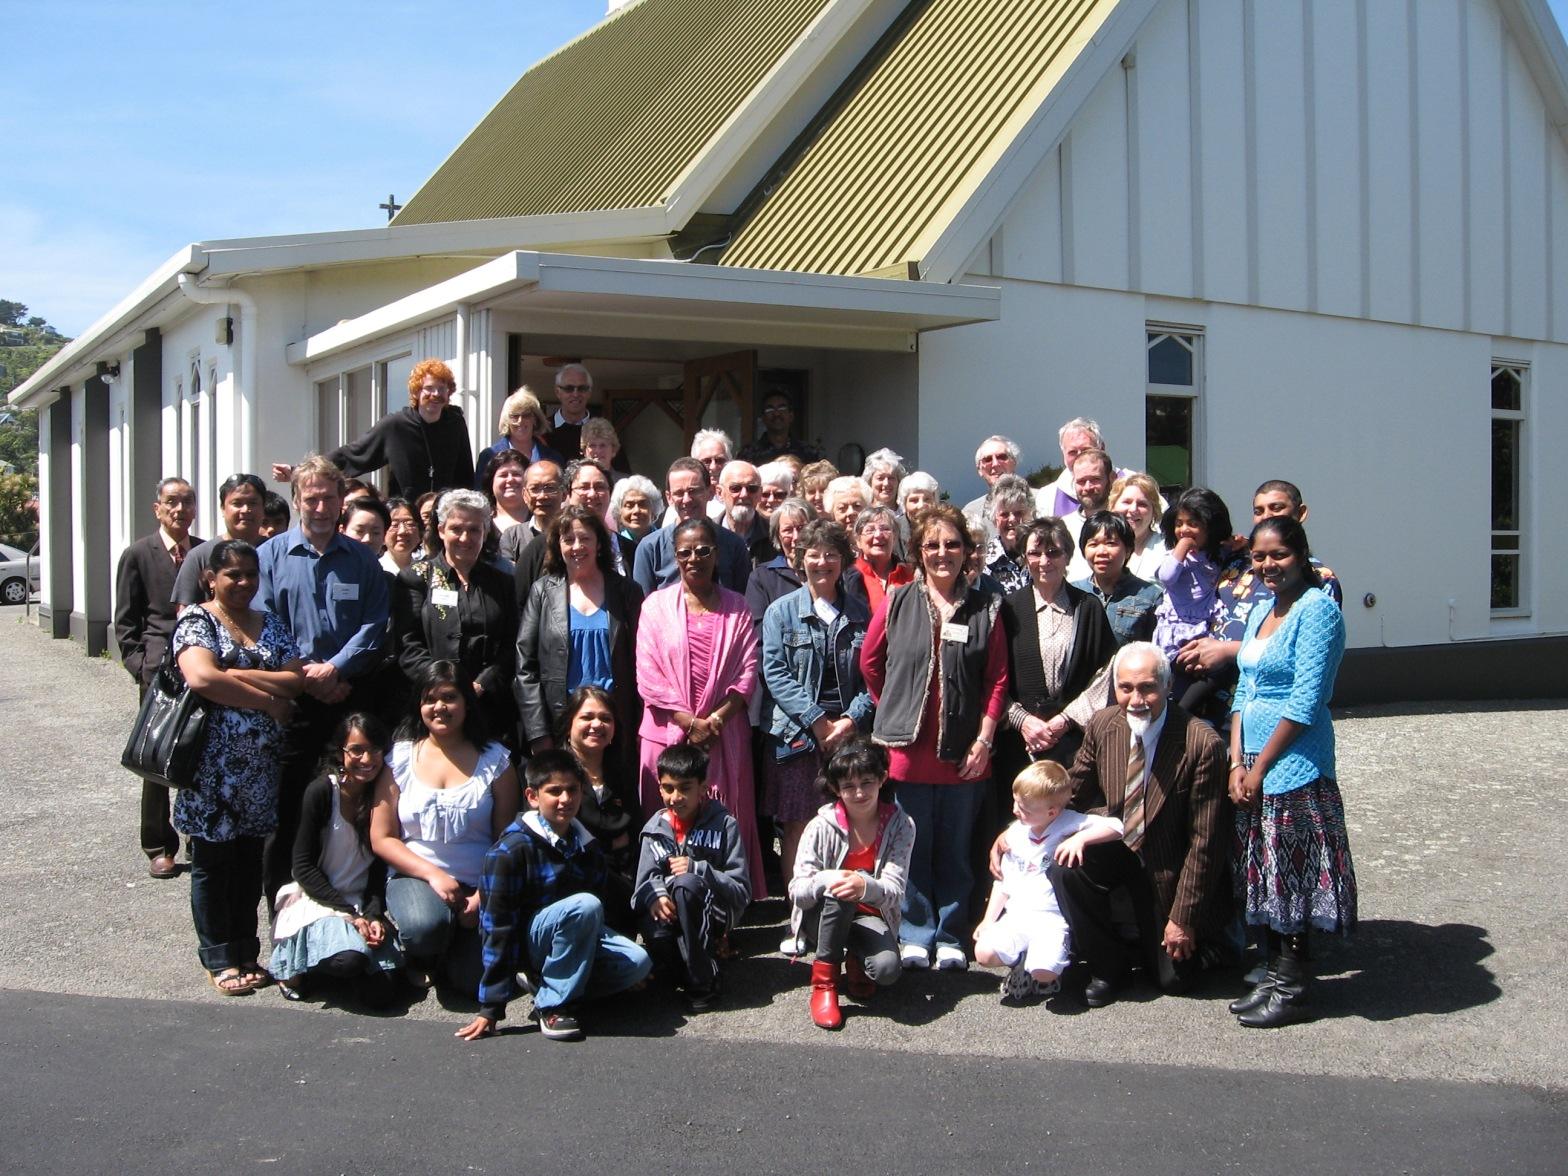 Congregation standing outside St John's church